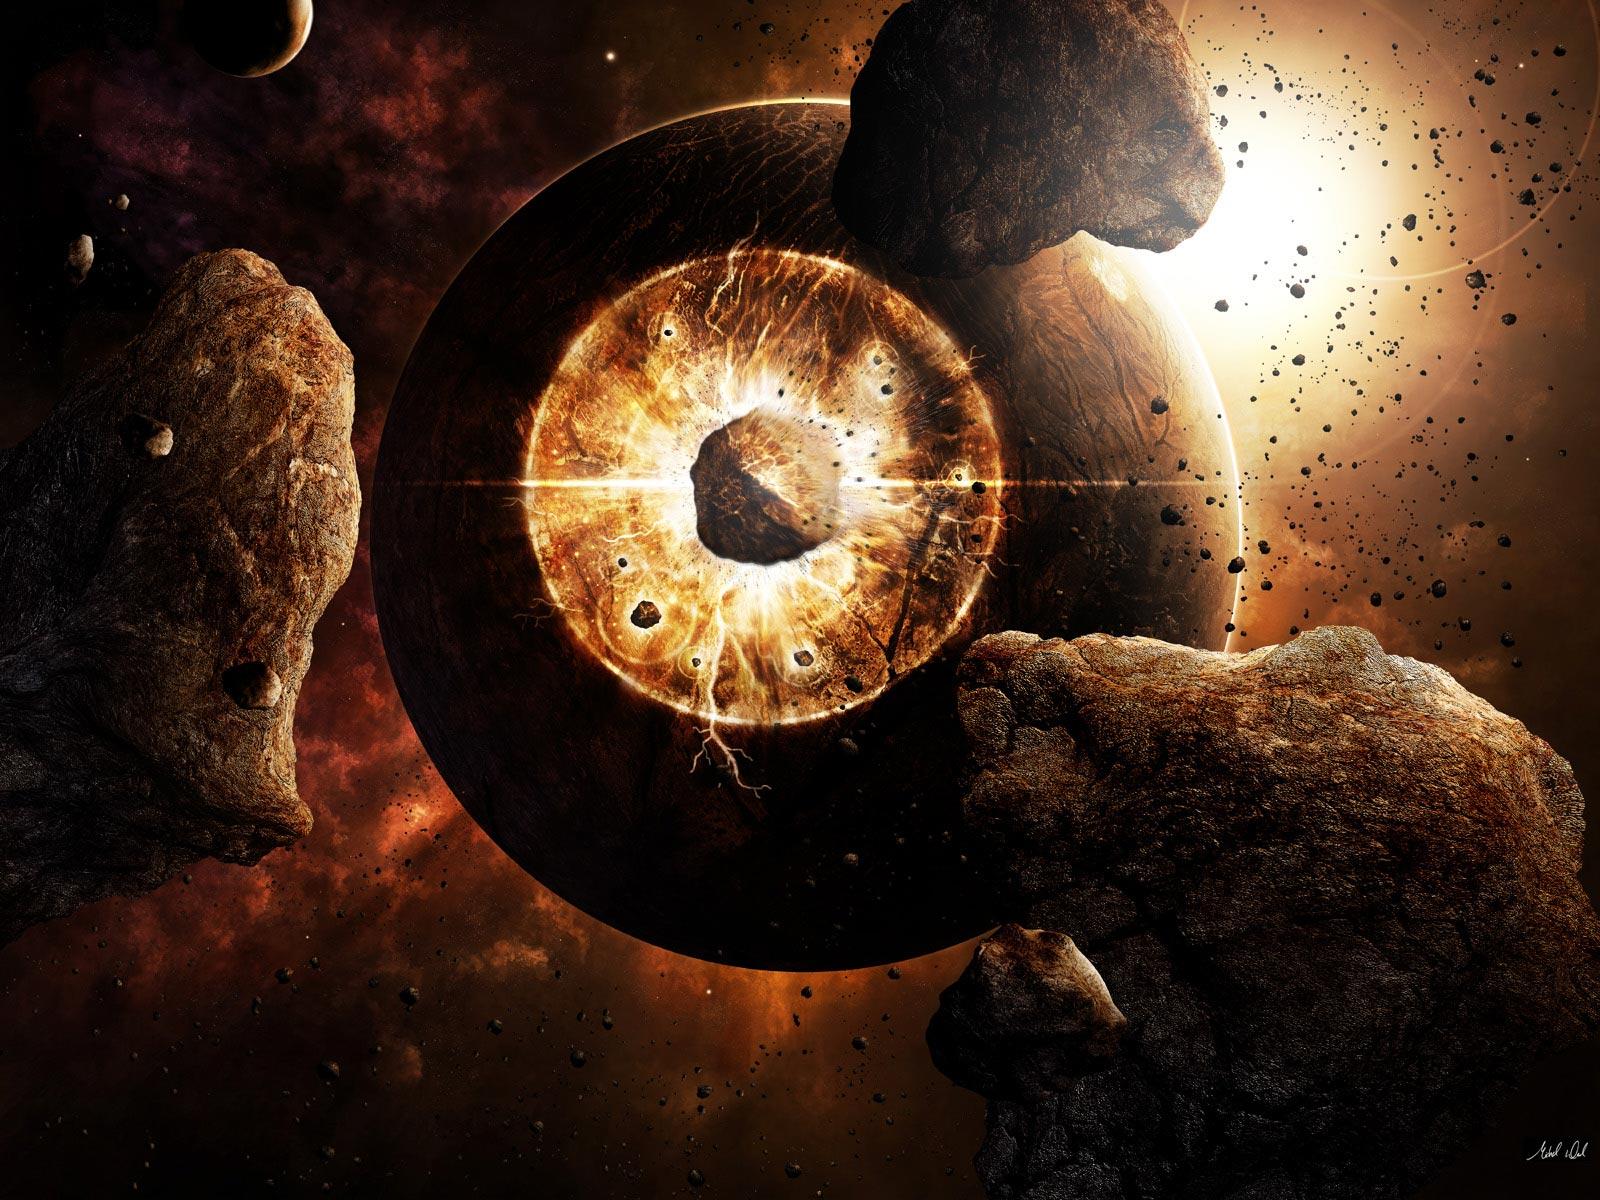 abaddon space art wallpaper